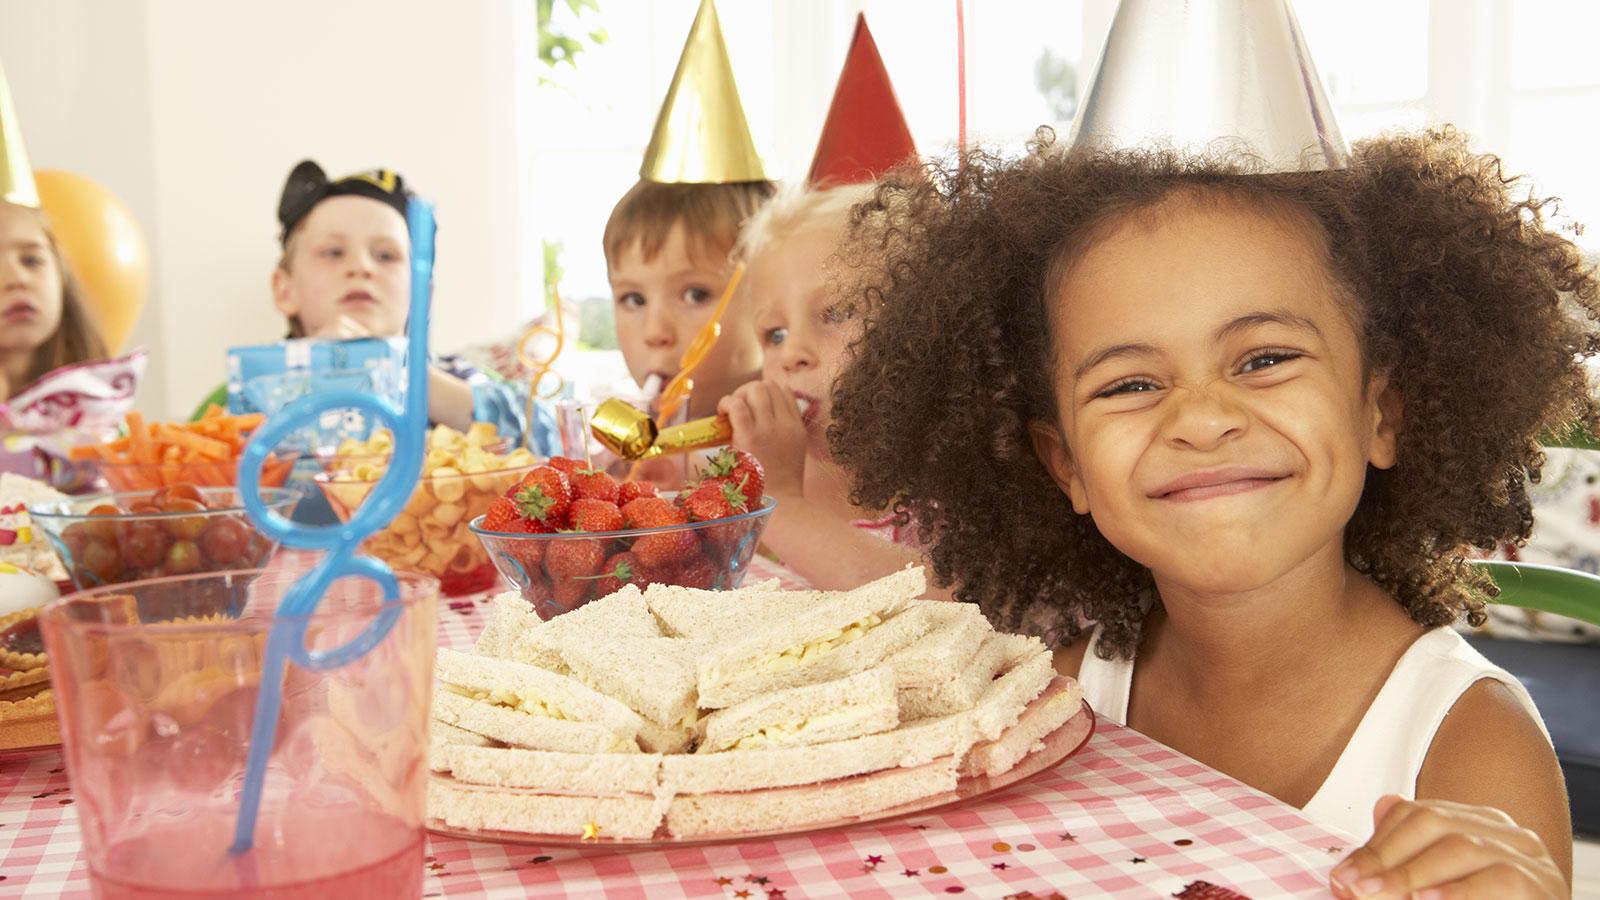 Children at a birthday party.